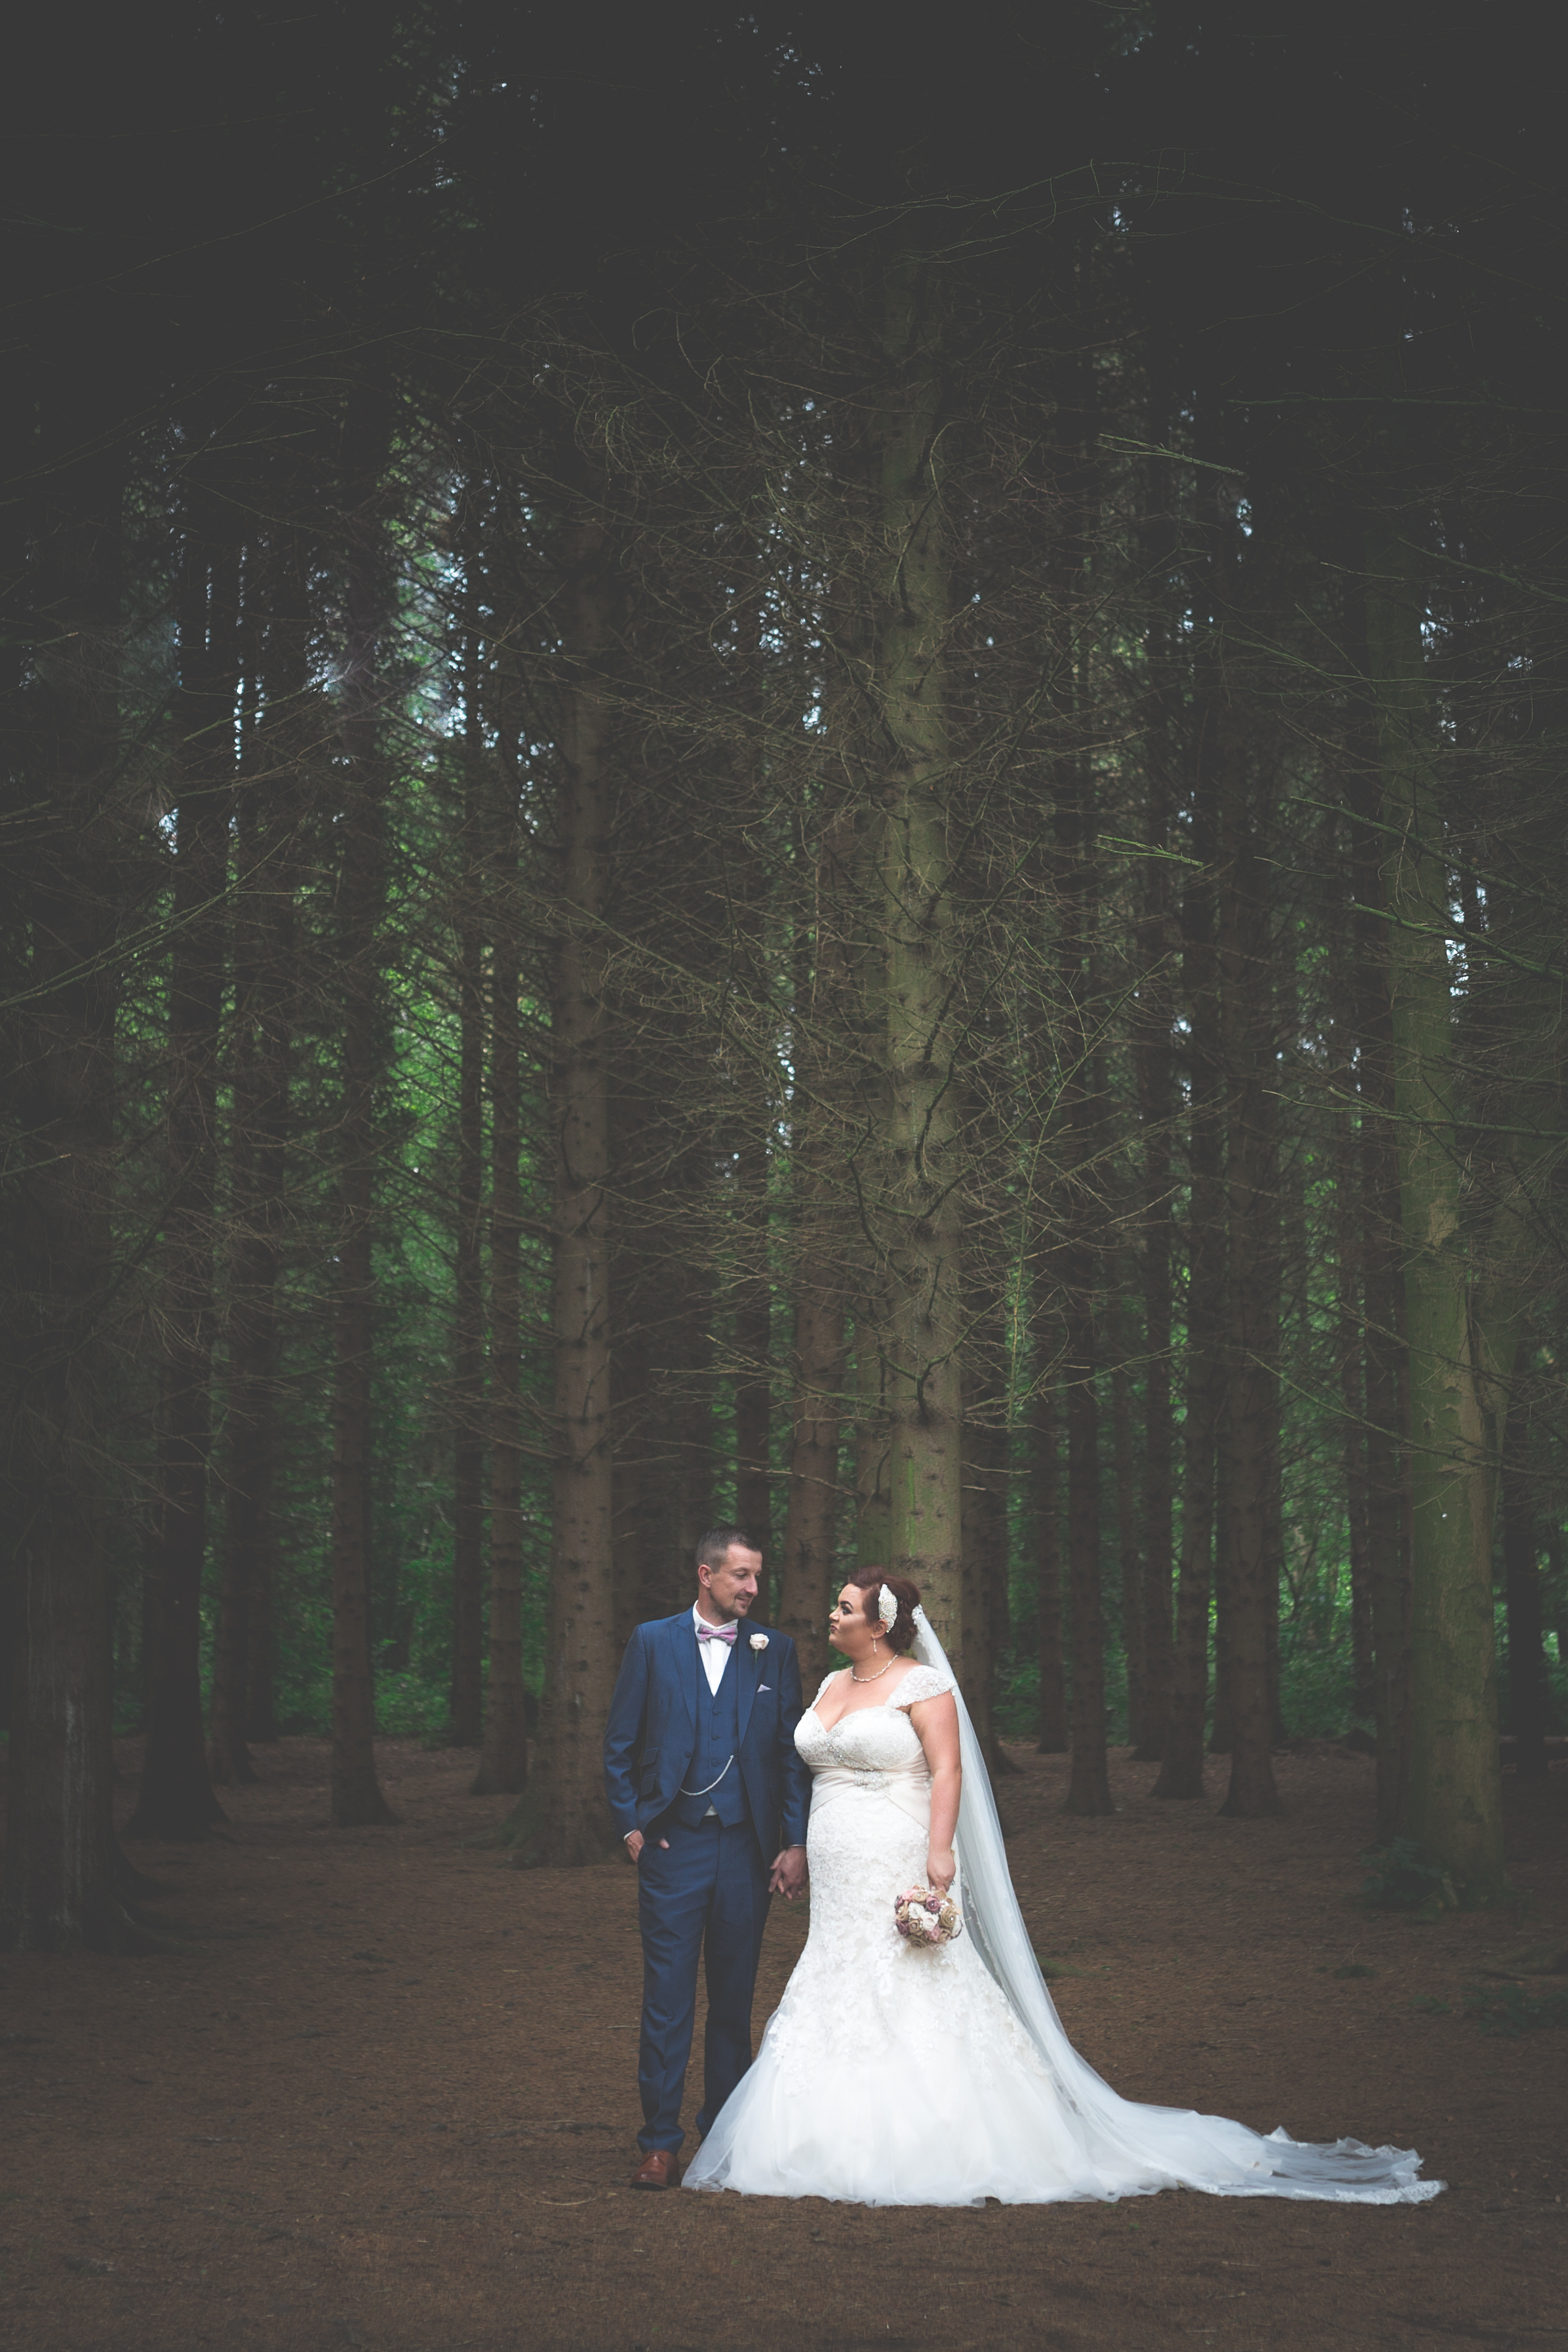 Antoinette & Stephen - Portraits   Brian McEwan Photography   Wedding Photographer Northern Ireland 19.jpg